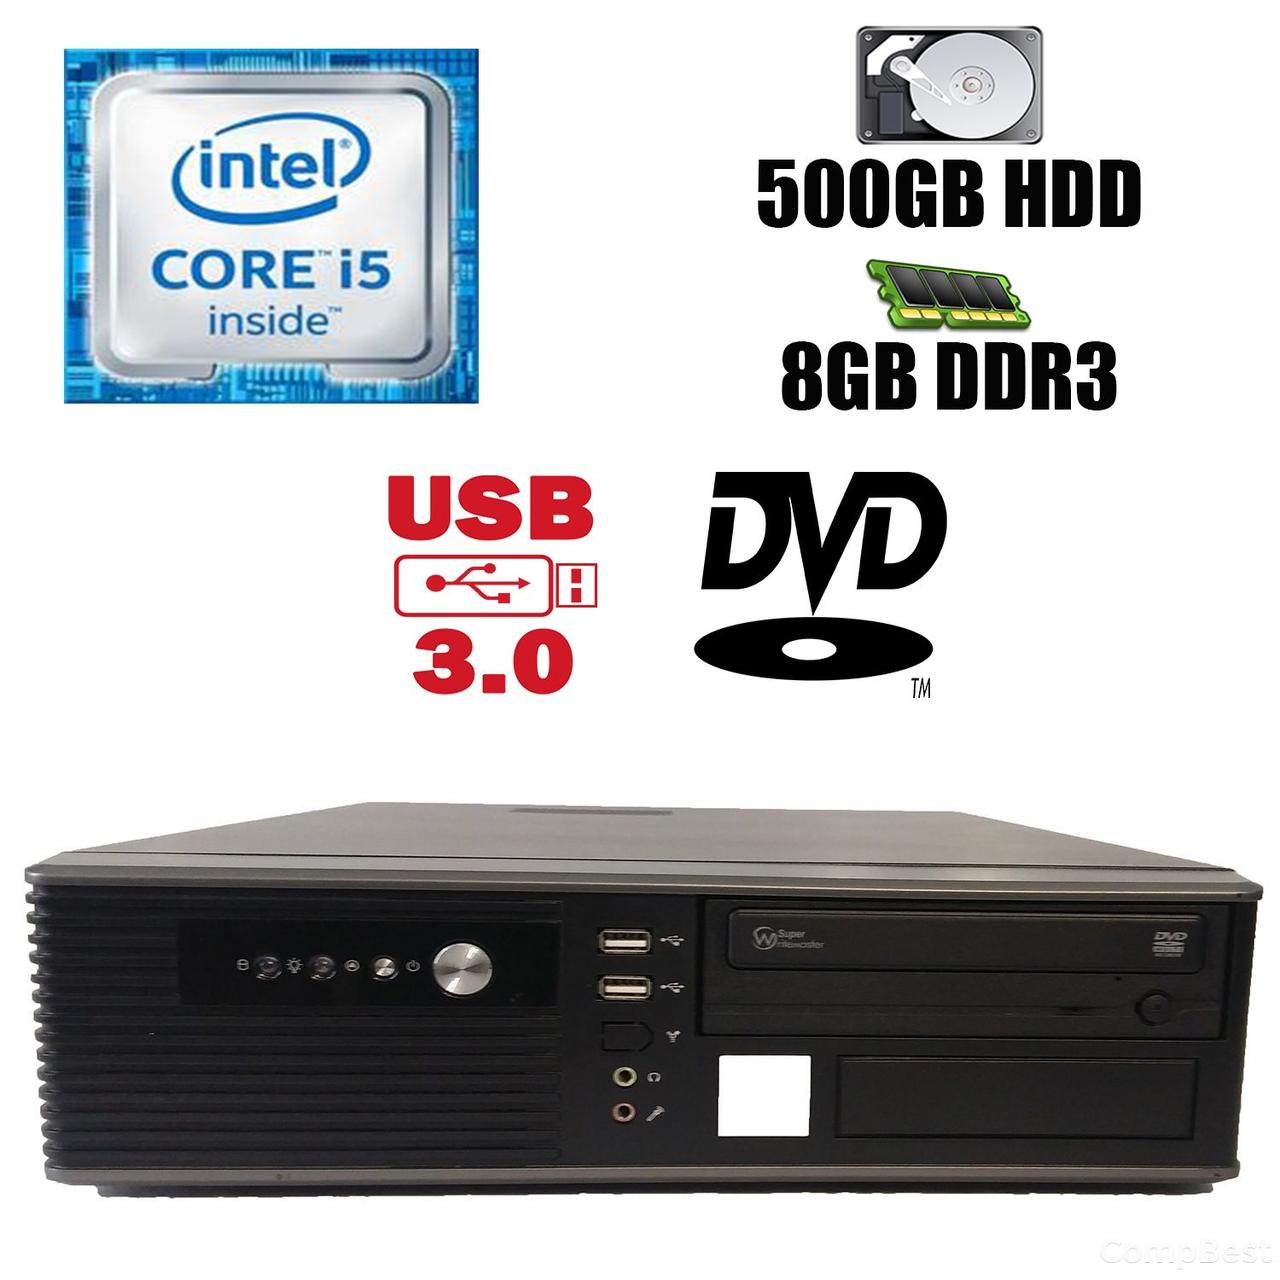 MSI SFF / Intel Core i5-2300 (4 ядра по 2.8-3.1GHz) / 8 GB DDR3 / 500 GB HDD / DVD привод / USB 3.0, SATA 3.0, PCI Express 3.0, i5-2300, 8, 500 HDD